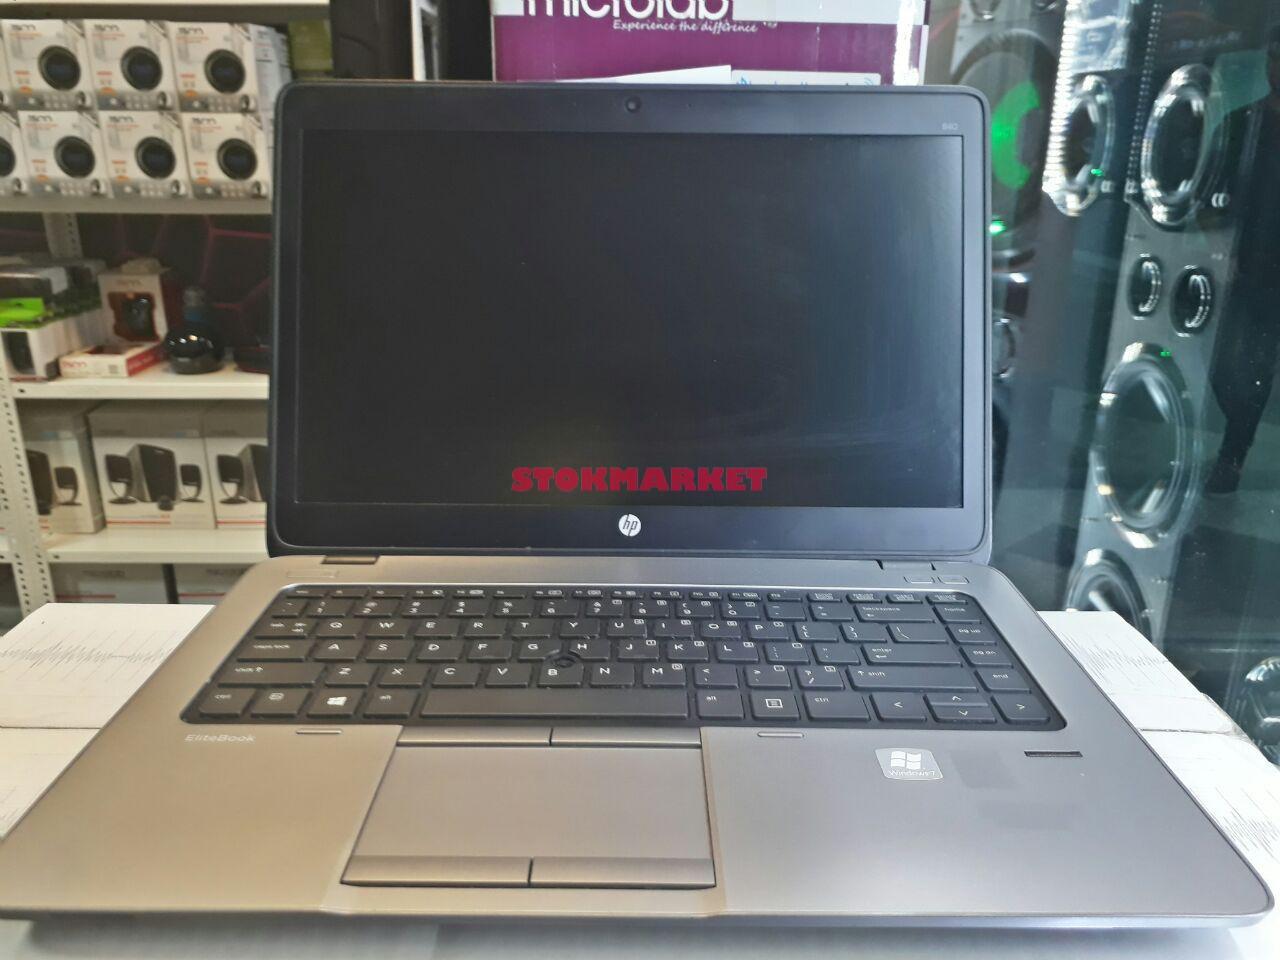 لپ تاپ استوک دست دوم مدل hp 840 |cori5 -ram 4gb- h.d.d 320